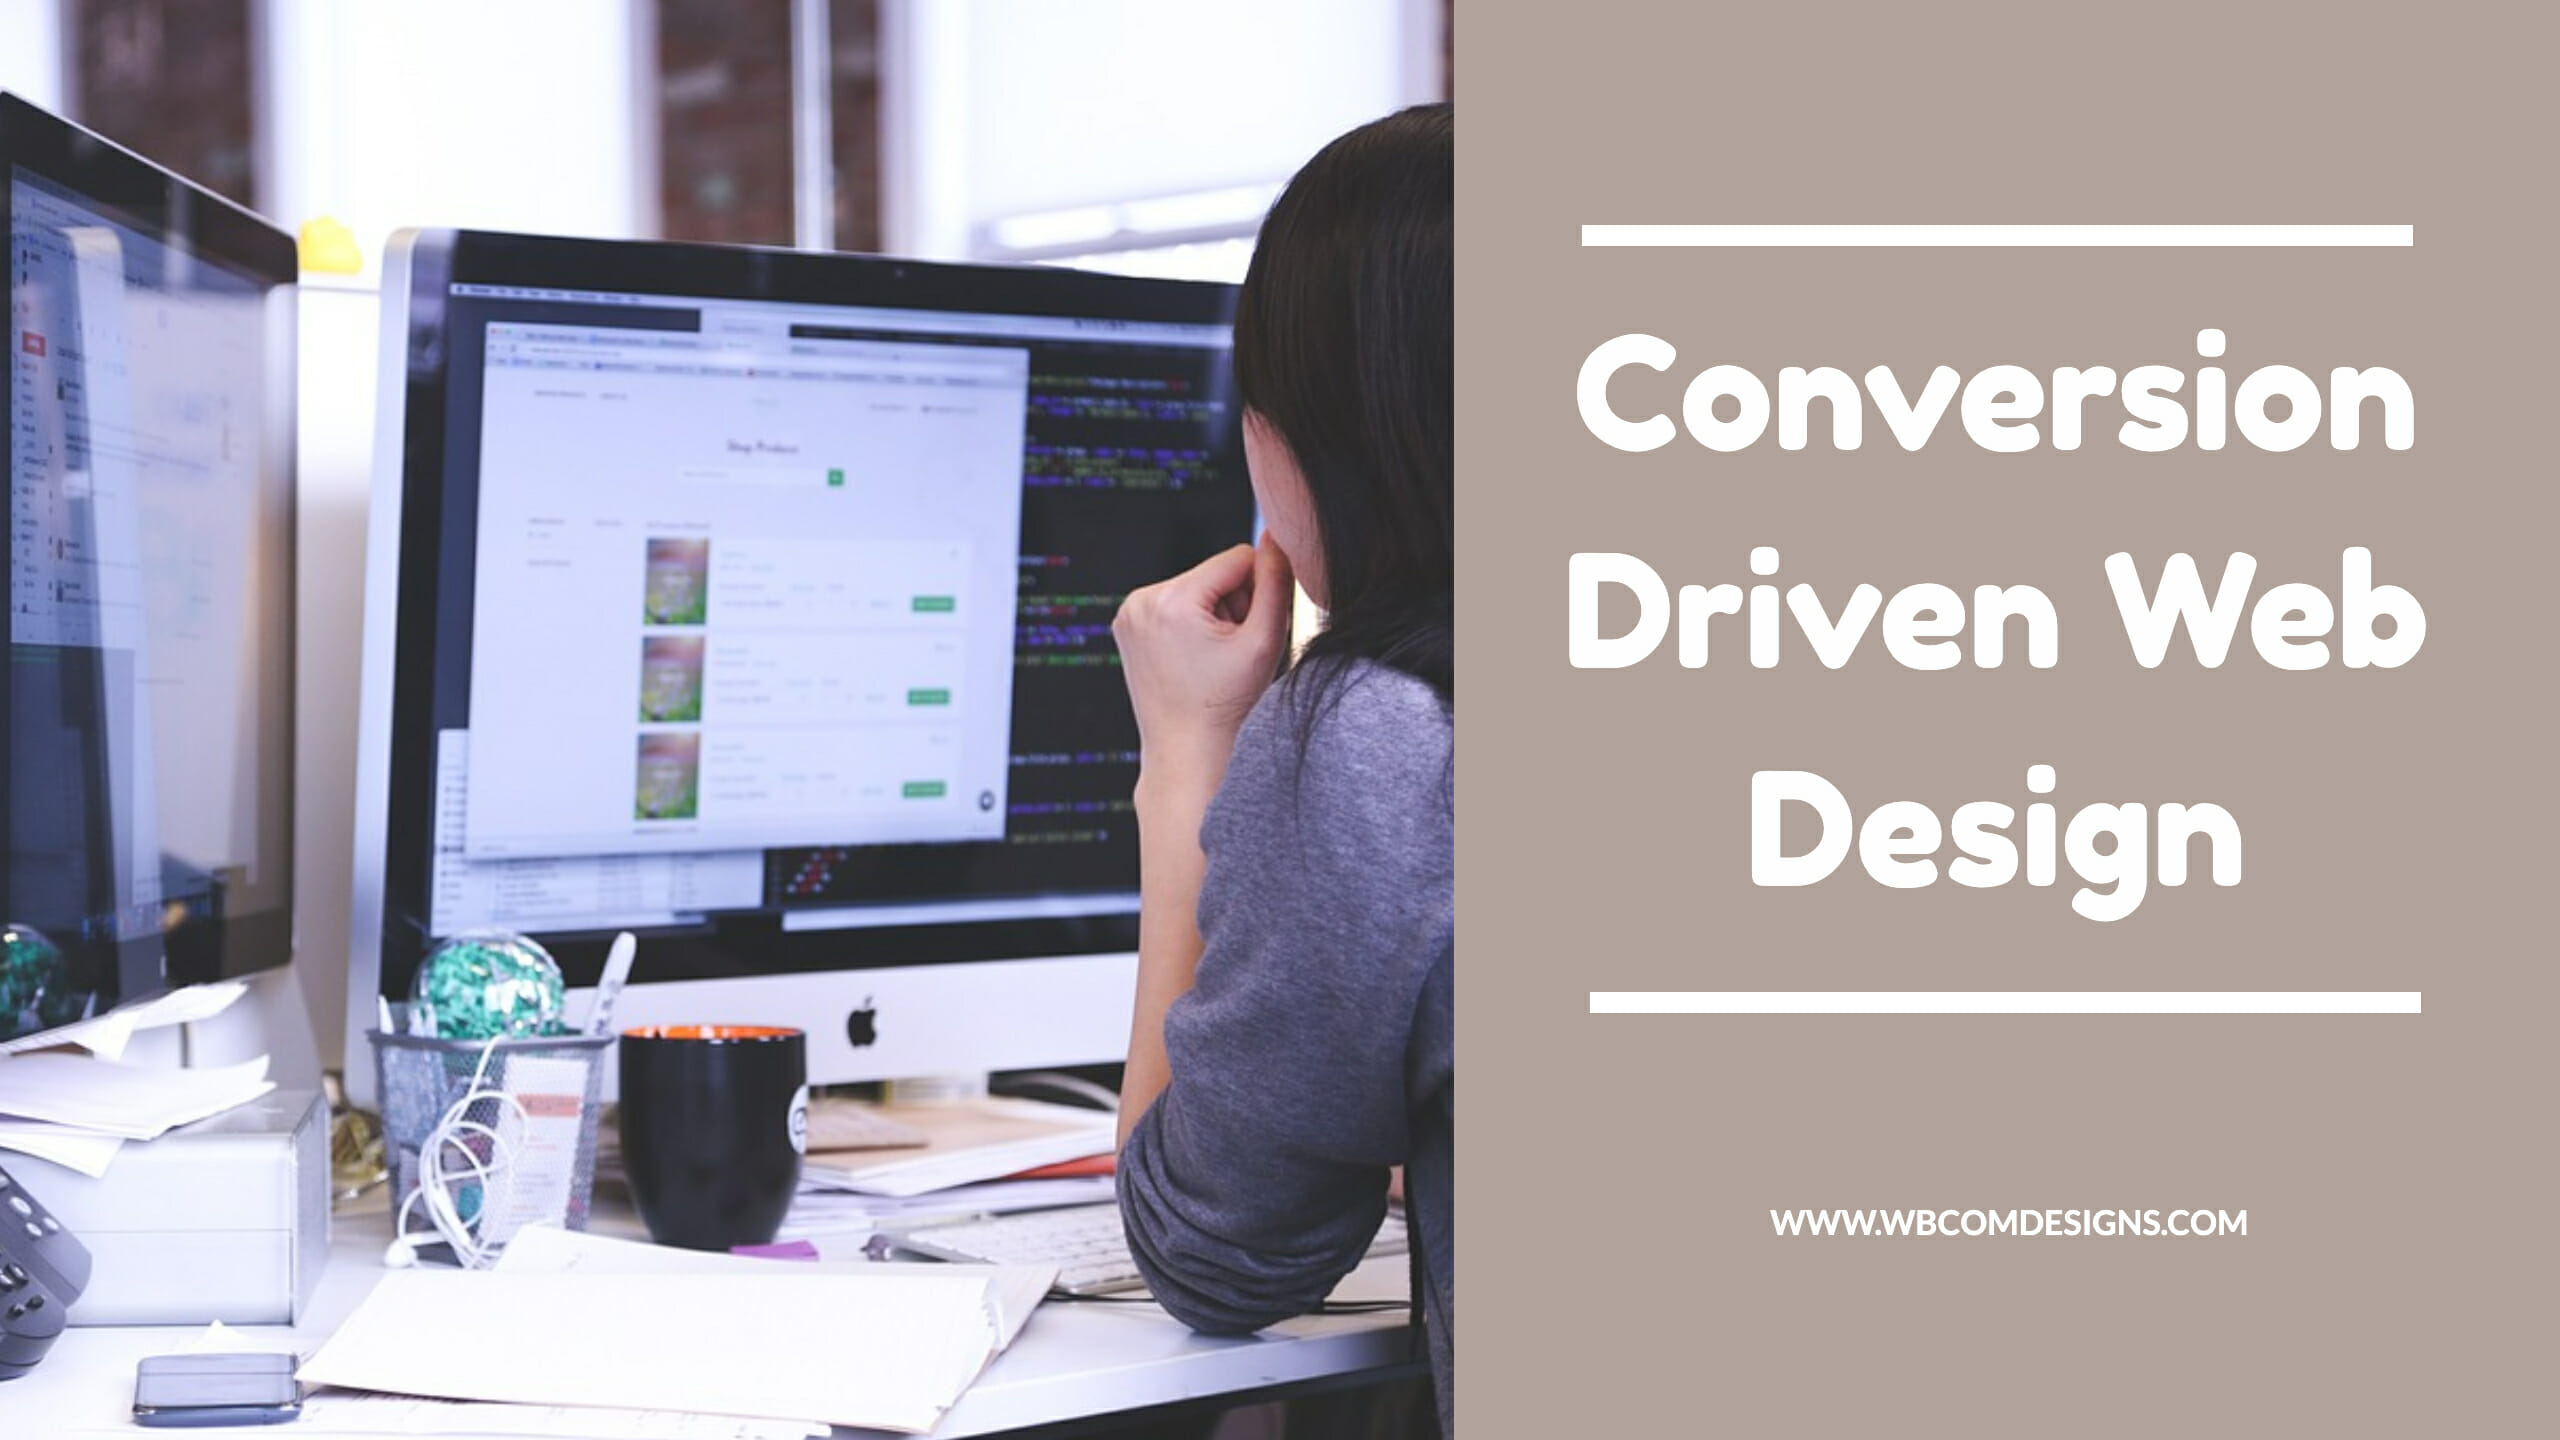 Tips To Create A Conversion Driven Web Design